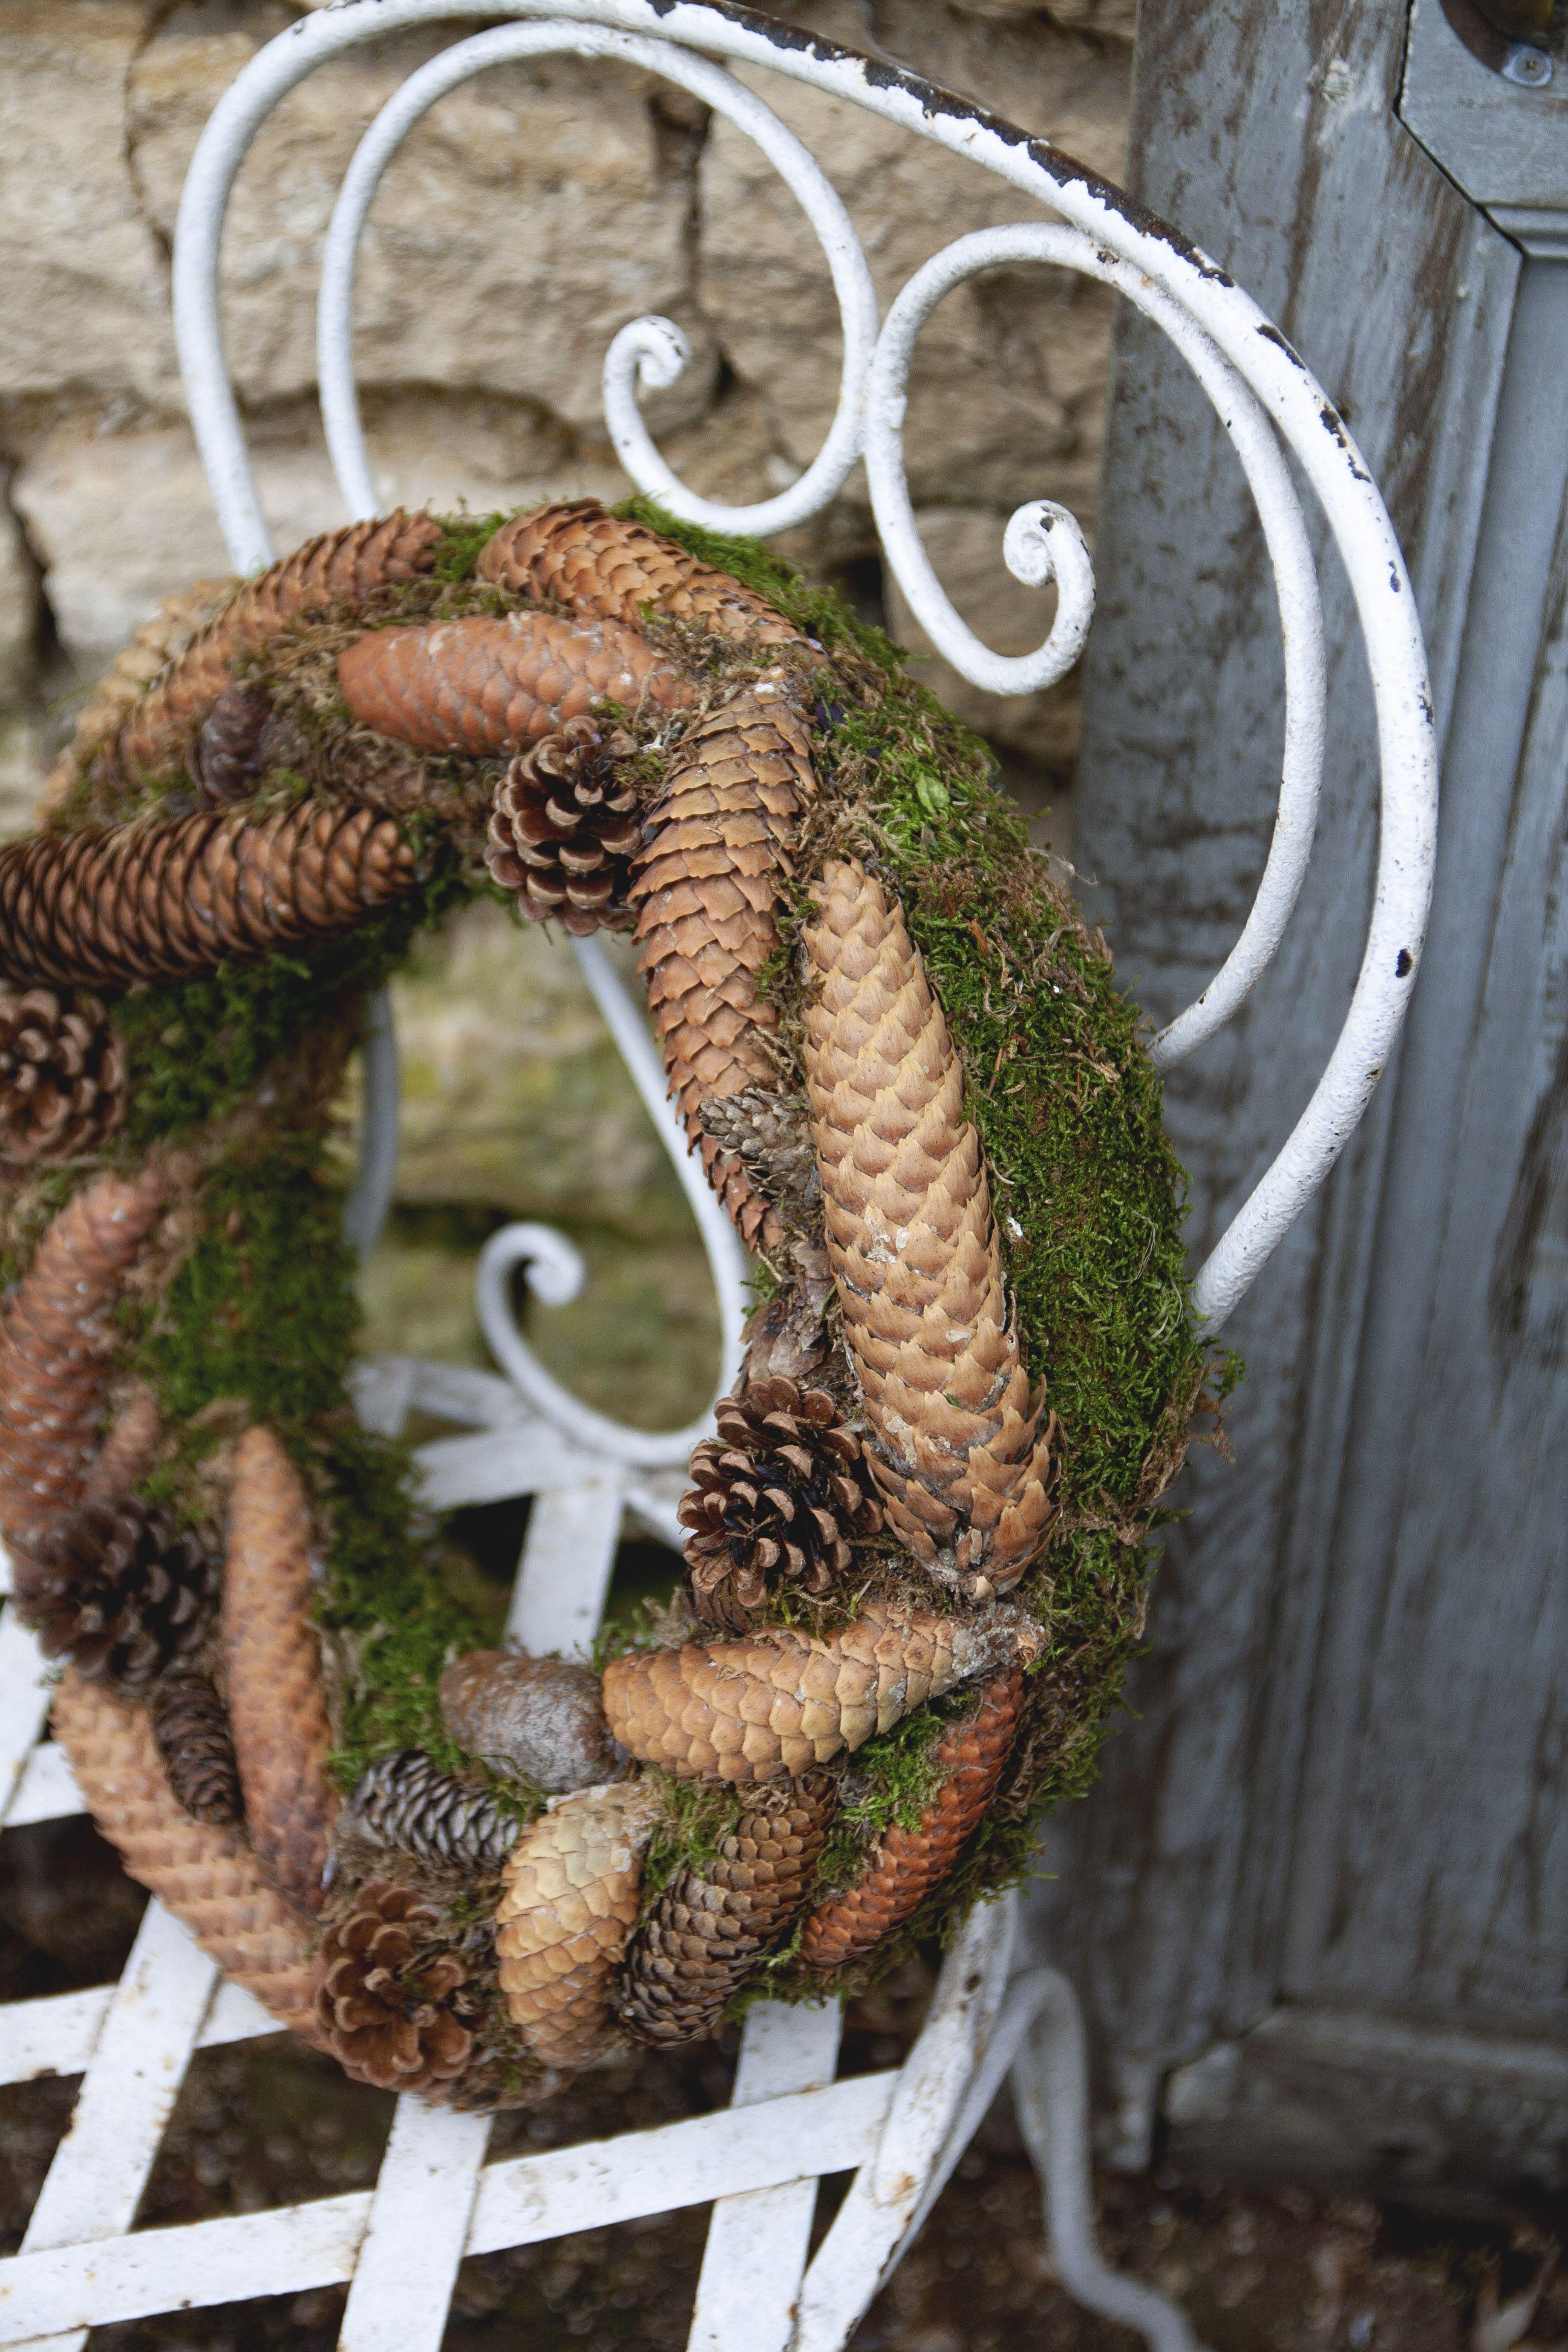 Evelyne Warchol Le Bonheur A La Campagne Guest House Chambres D Hotes Champagne Ardenne Hiver Winter Decor Christmas Wreaths Holiday Decor Burlap Wreath